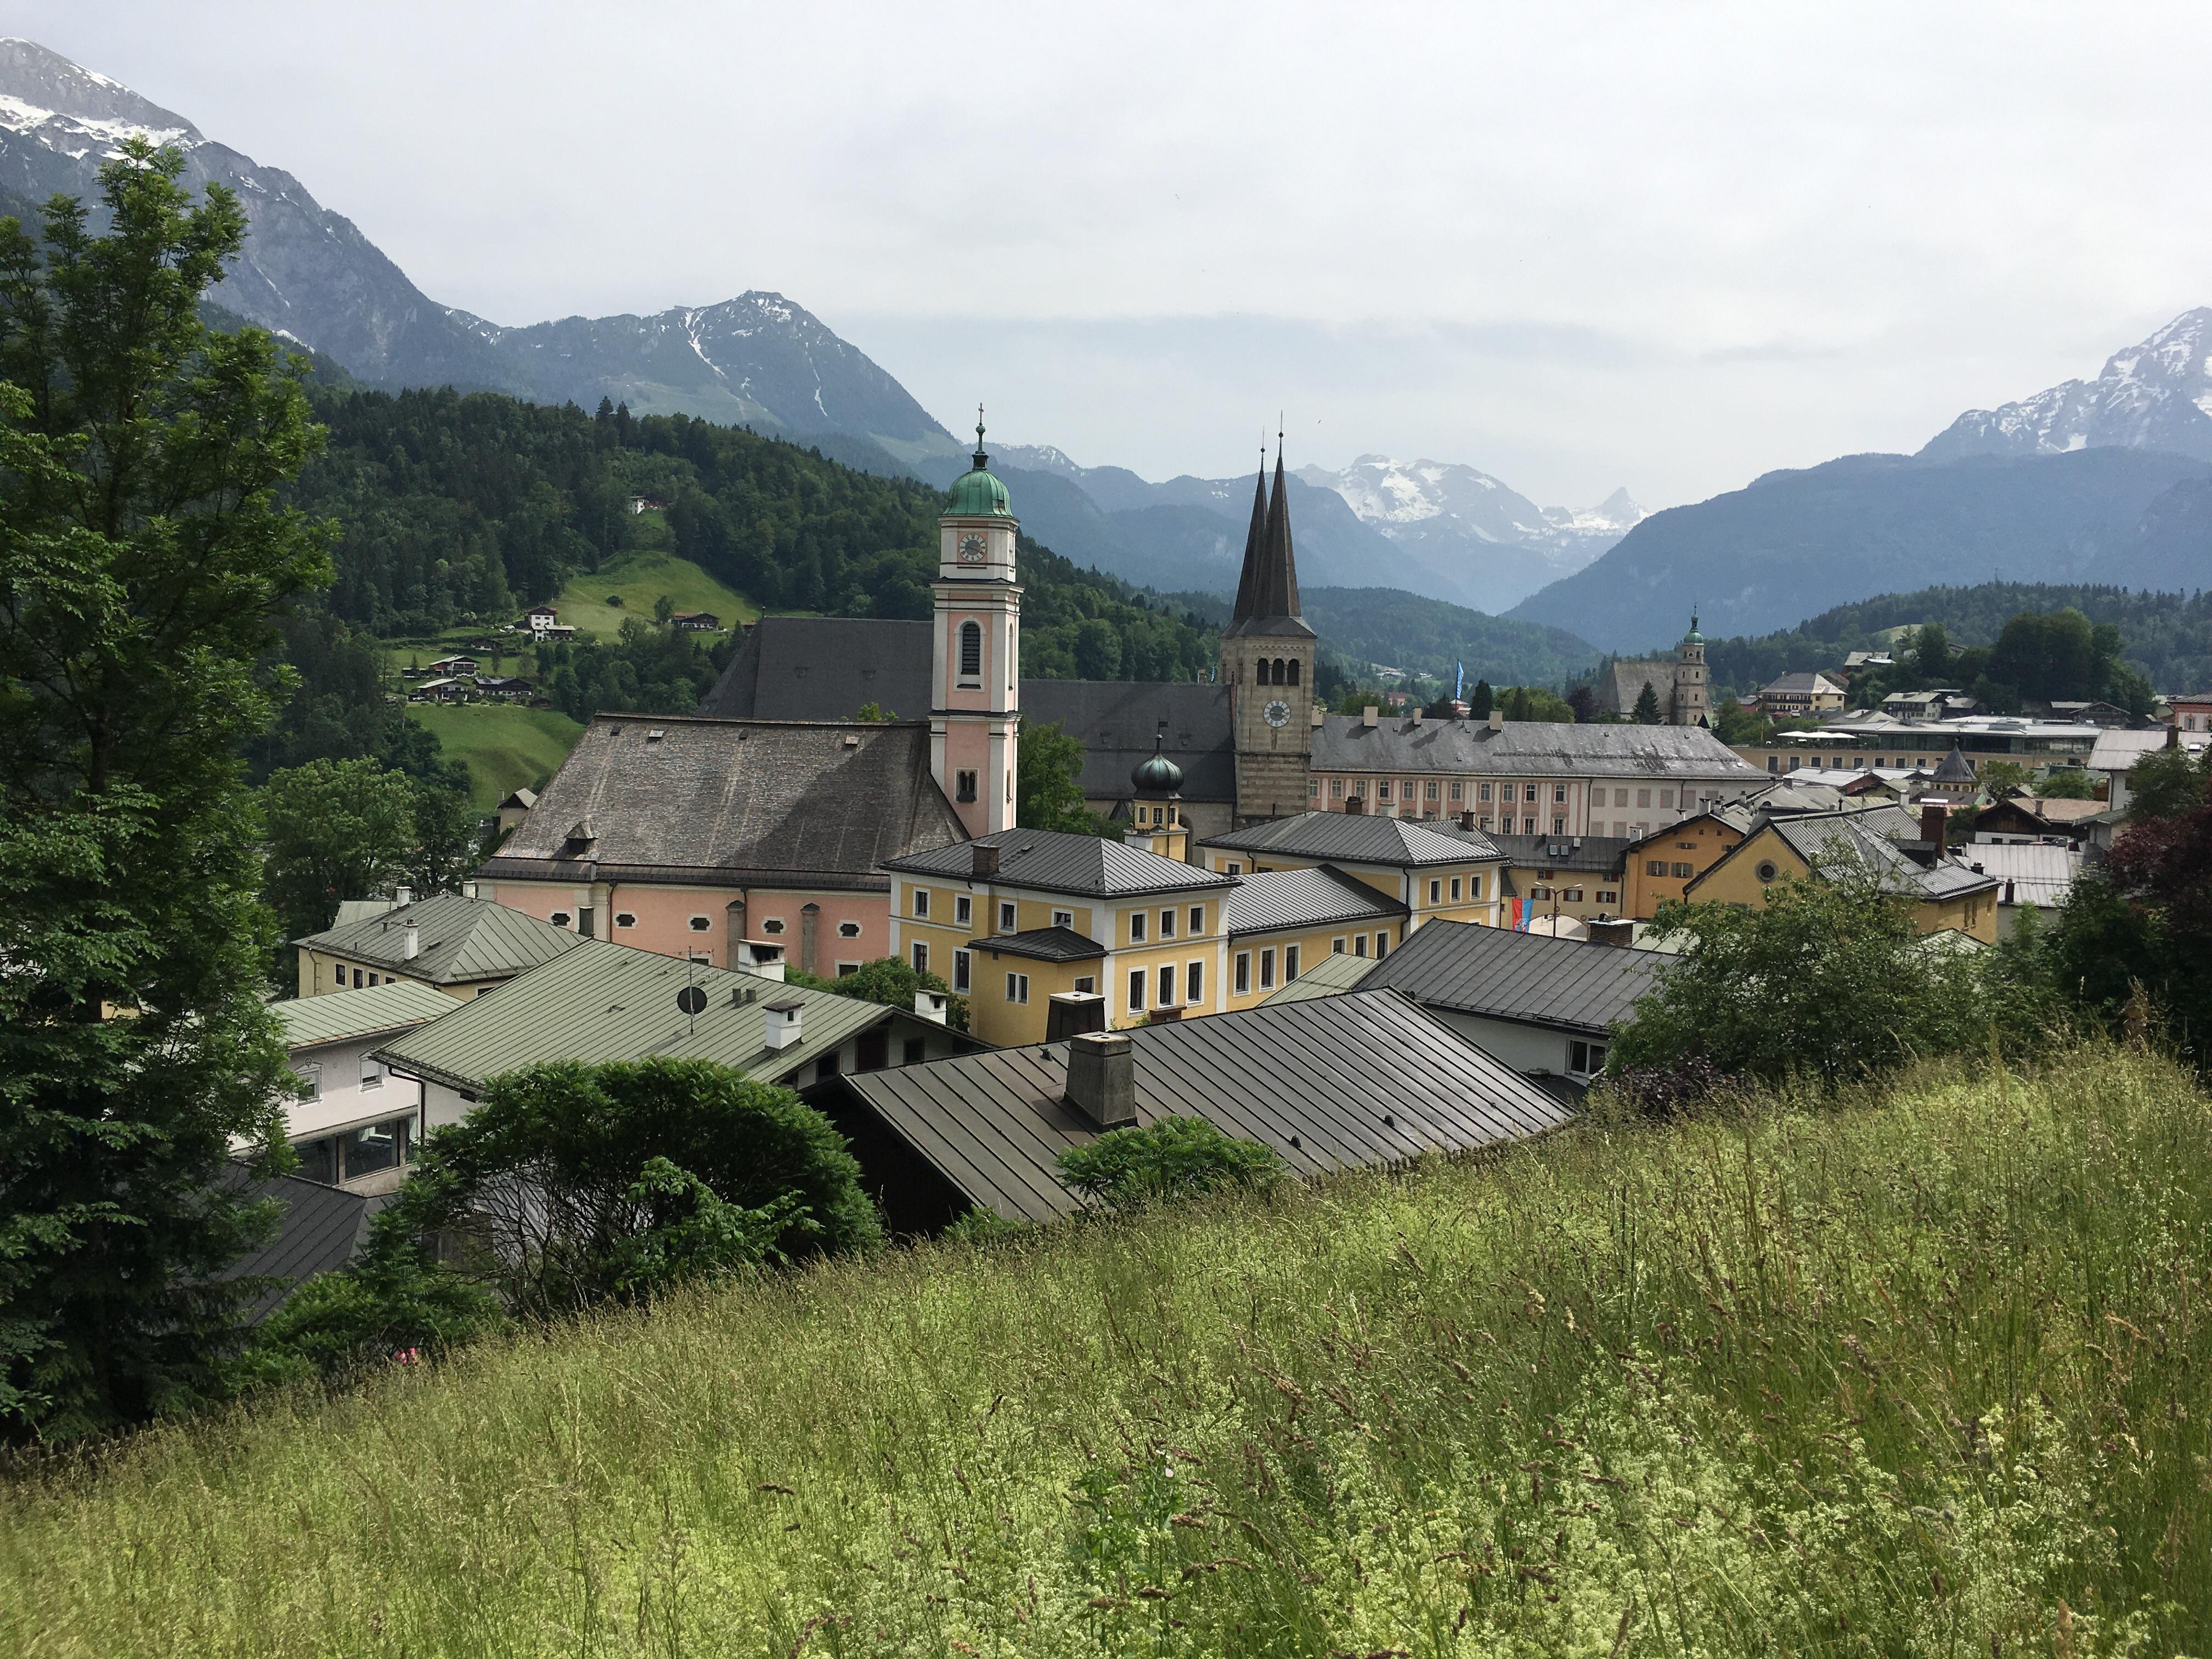 Blick auf Berchtesgaden